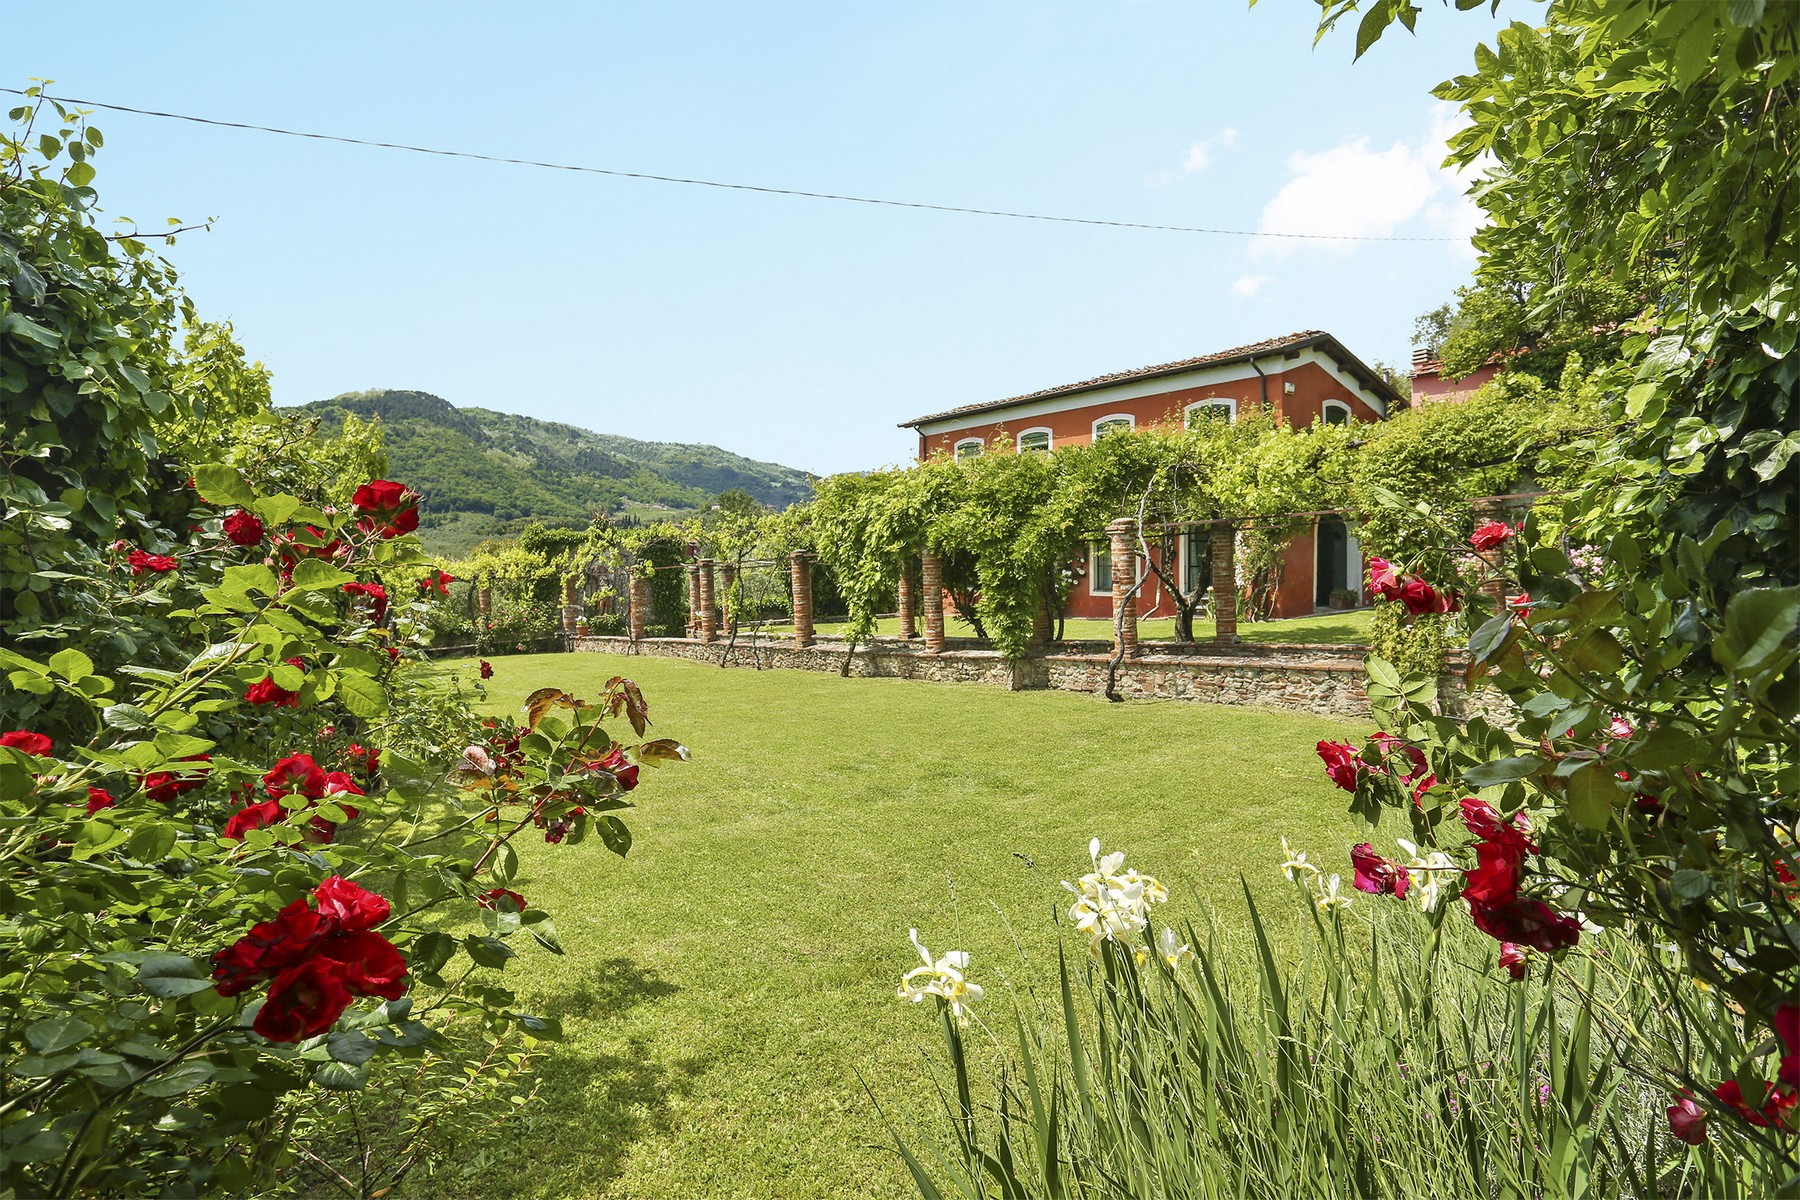 Villa in Vendita a Lucca: 5 locali, 735 mq - Foto 5